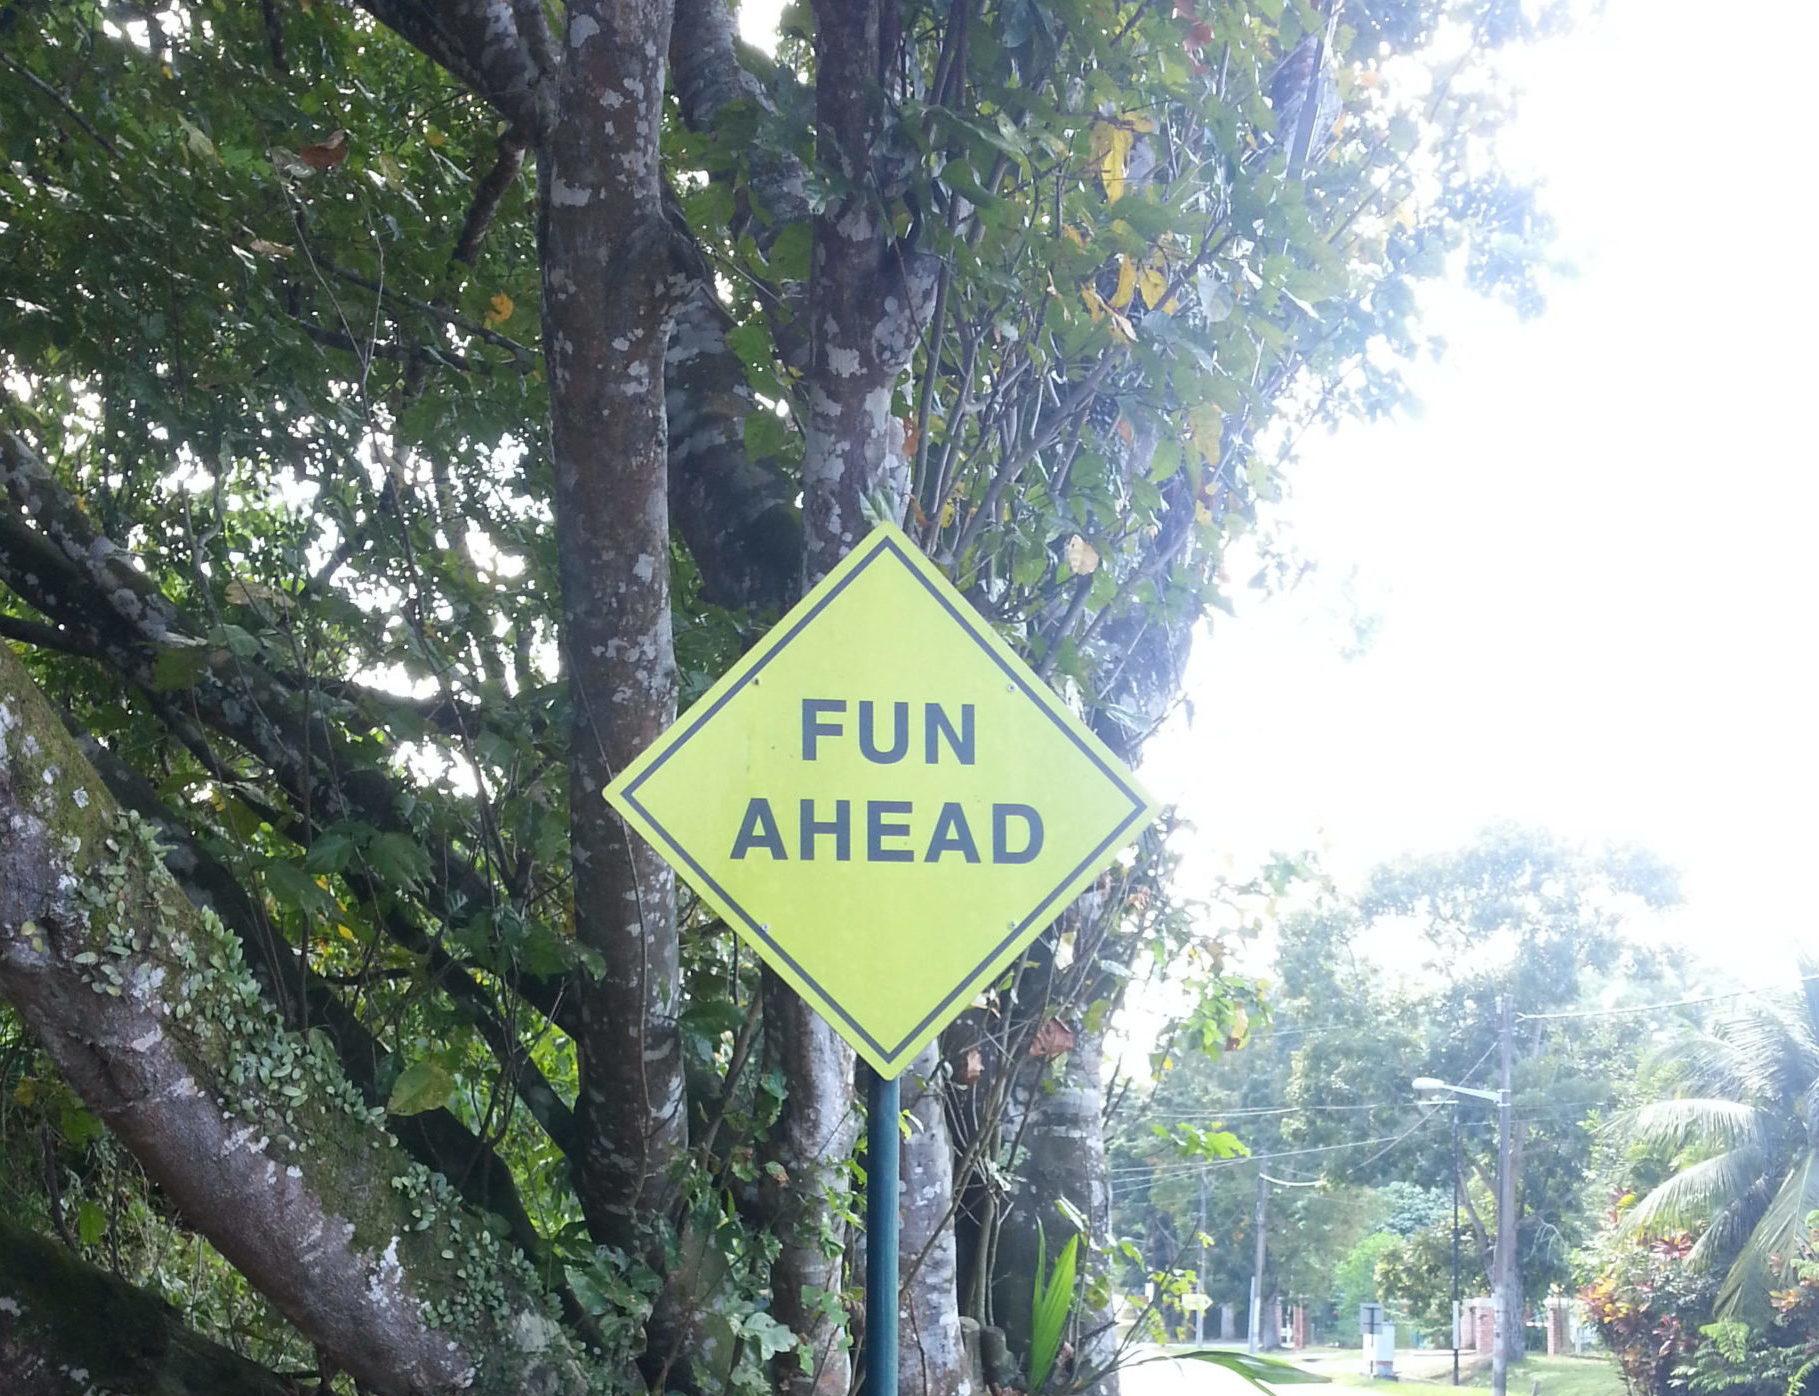 Street sign in Penang